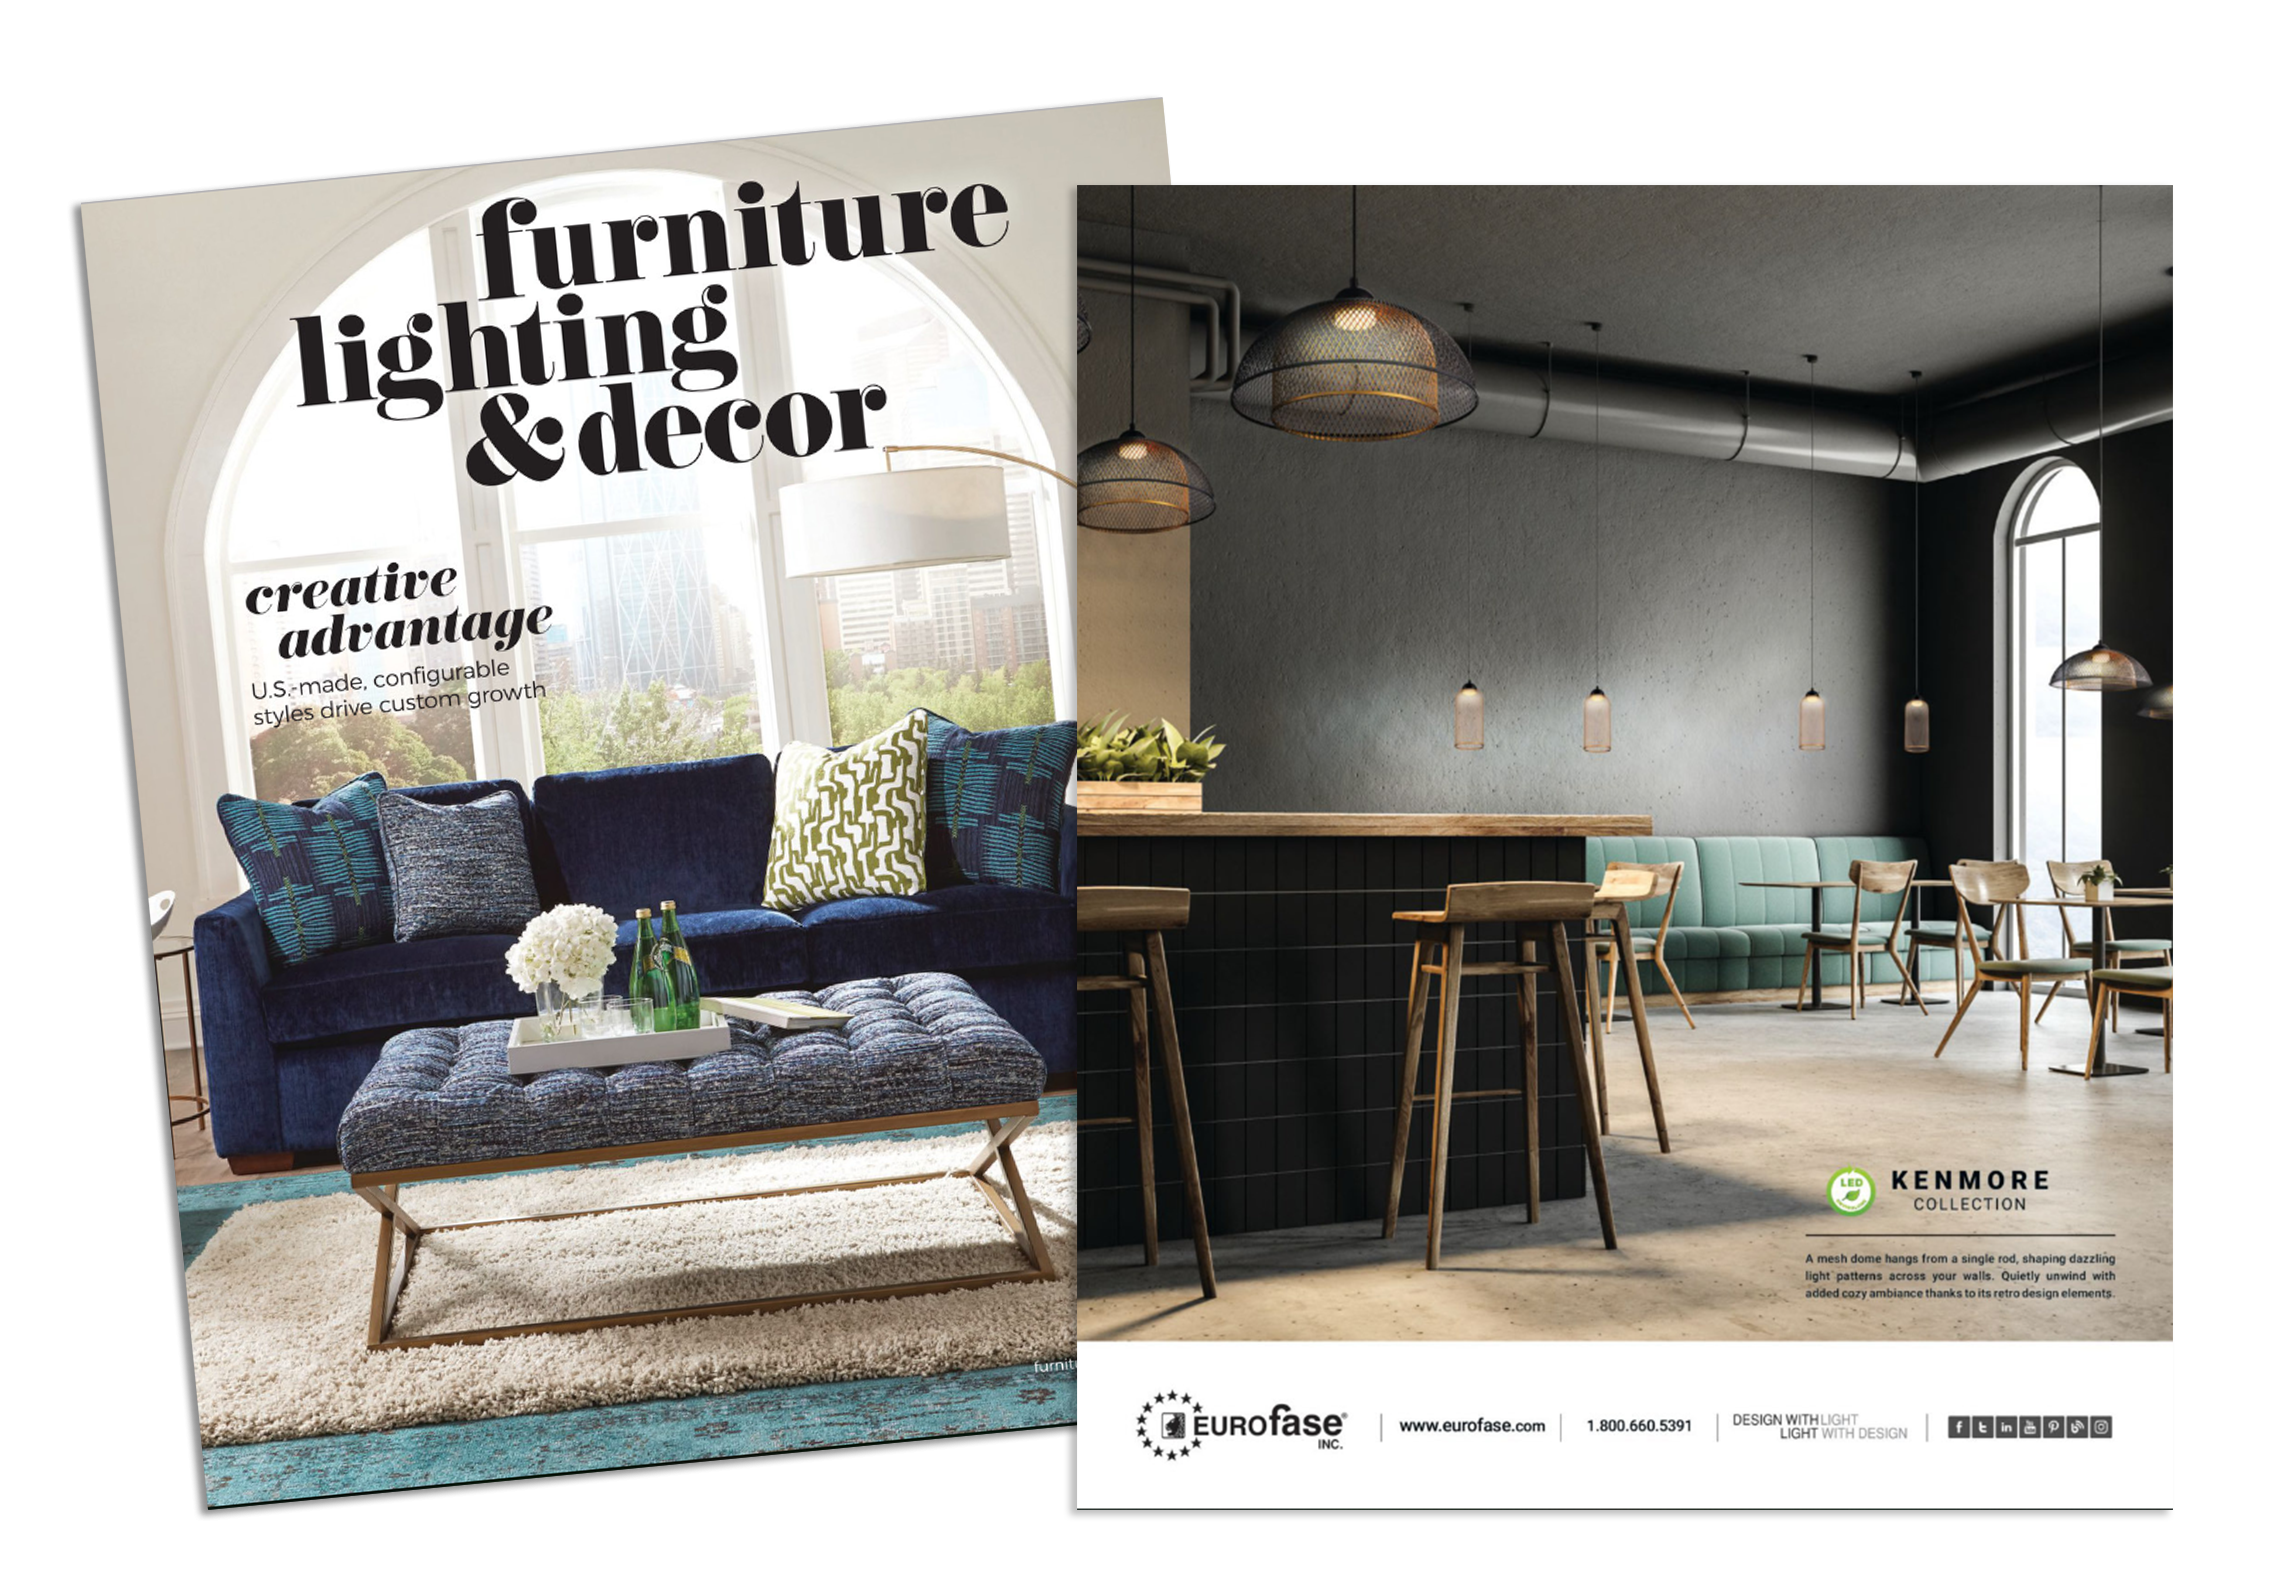 interior design lighting decor led